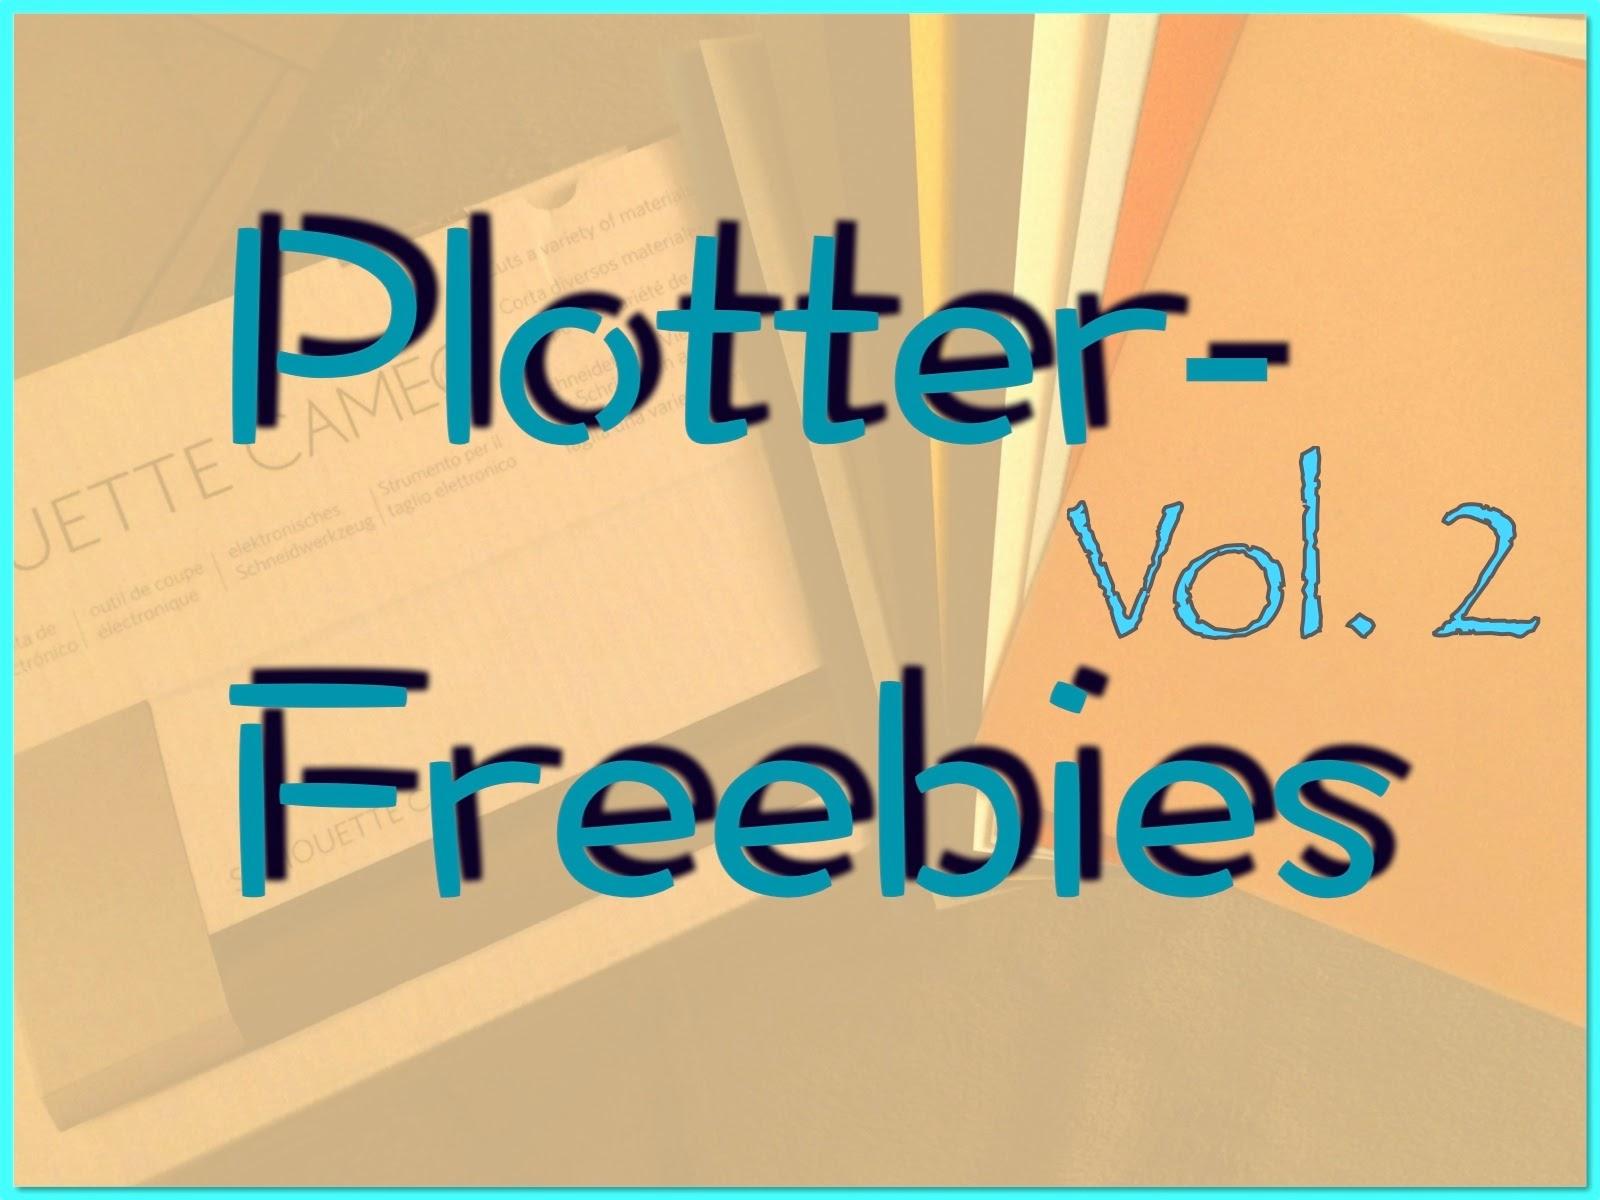 plotter freebie krone. Black Bedroom Furniture Sets. Home Design Ideas